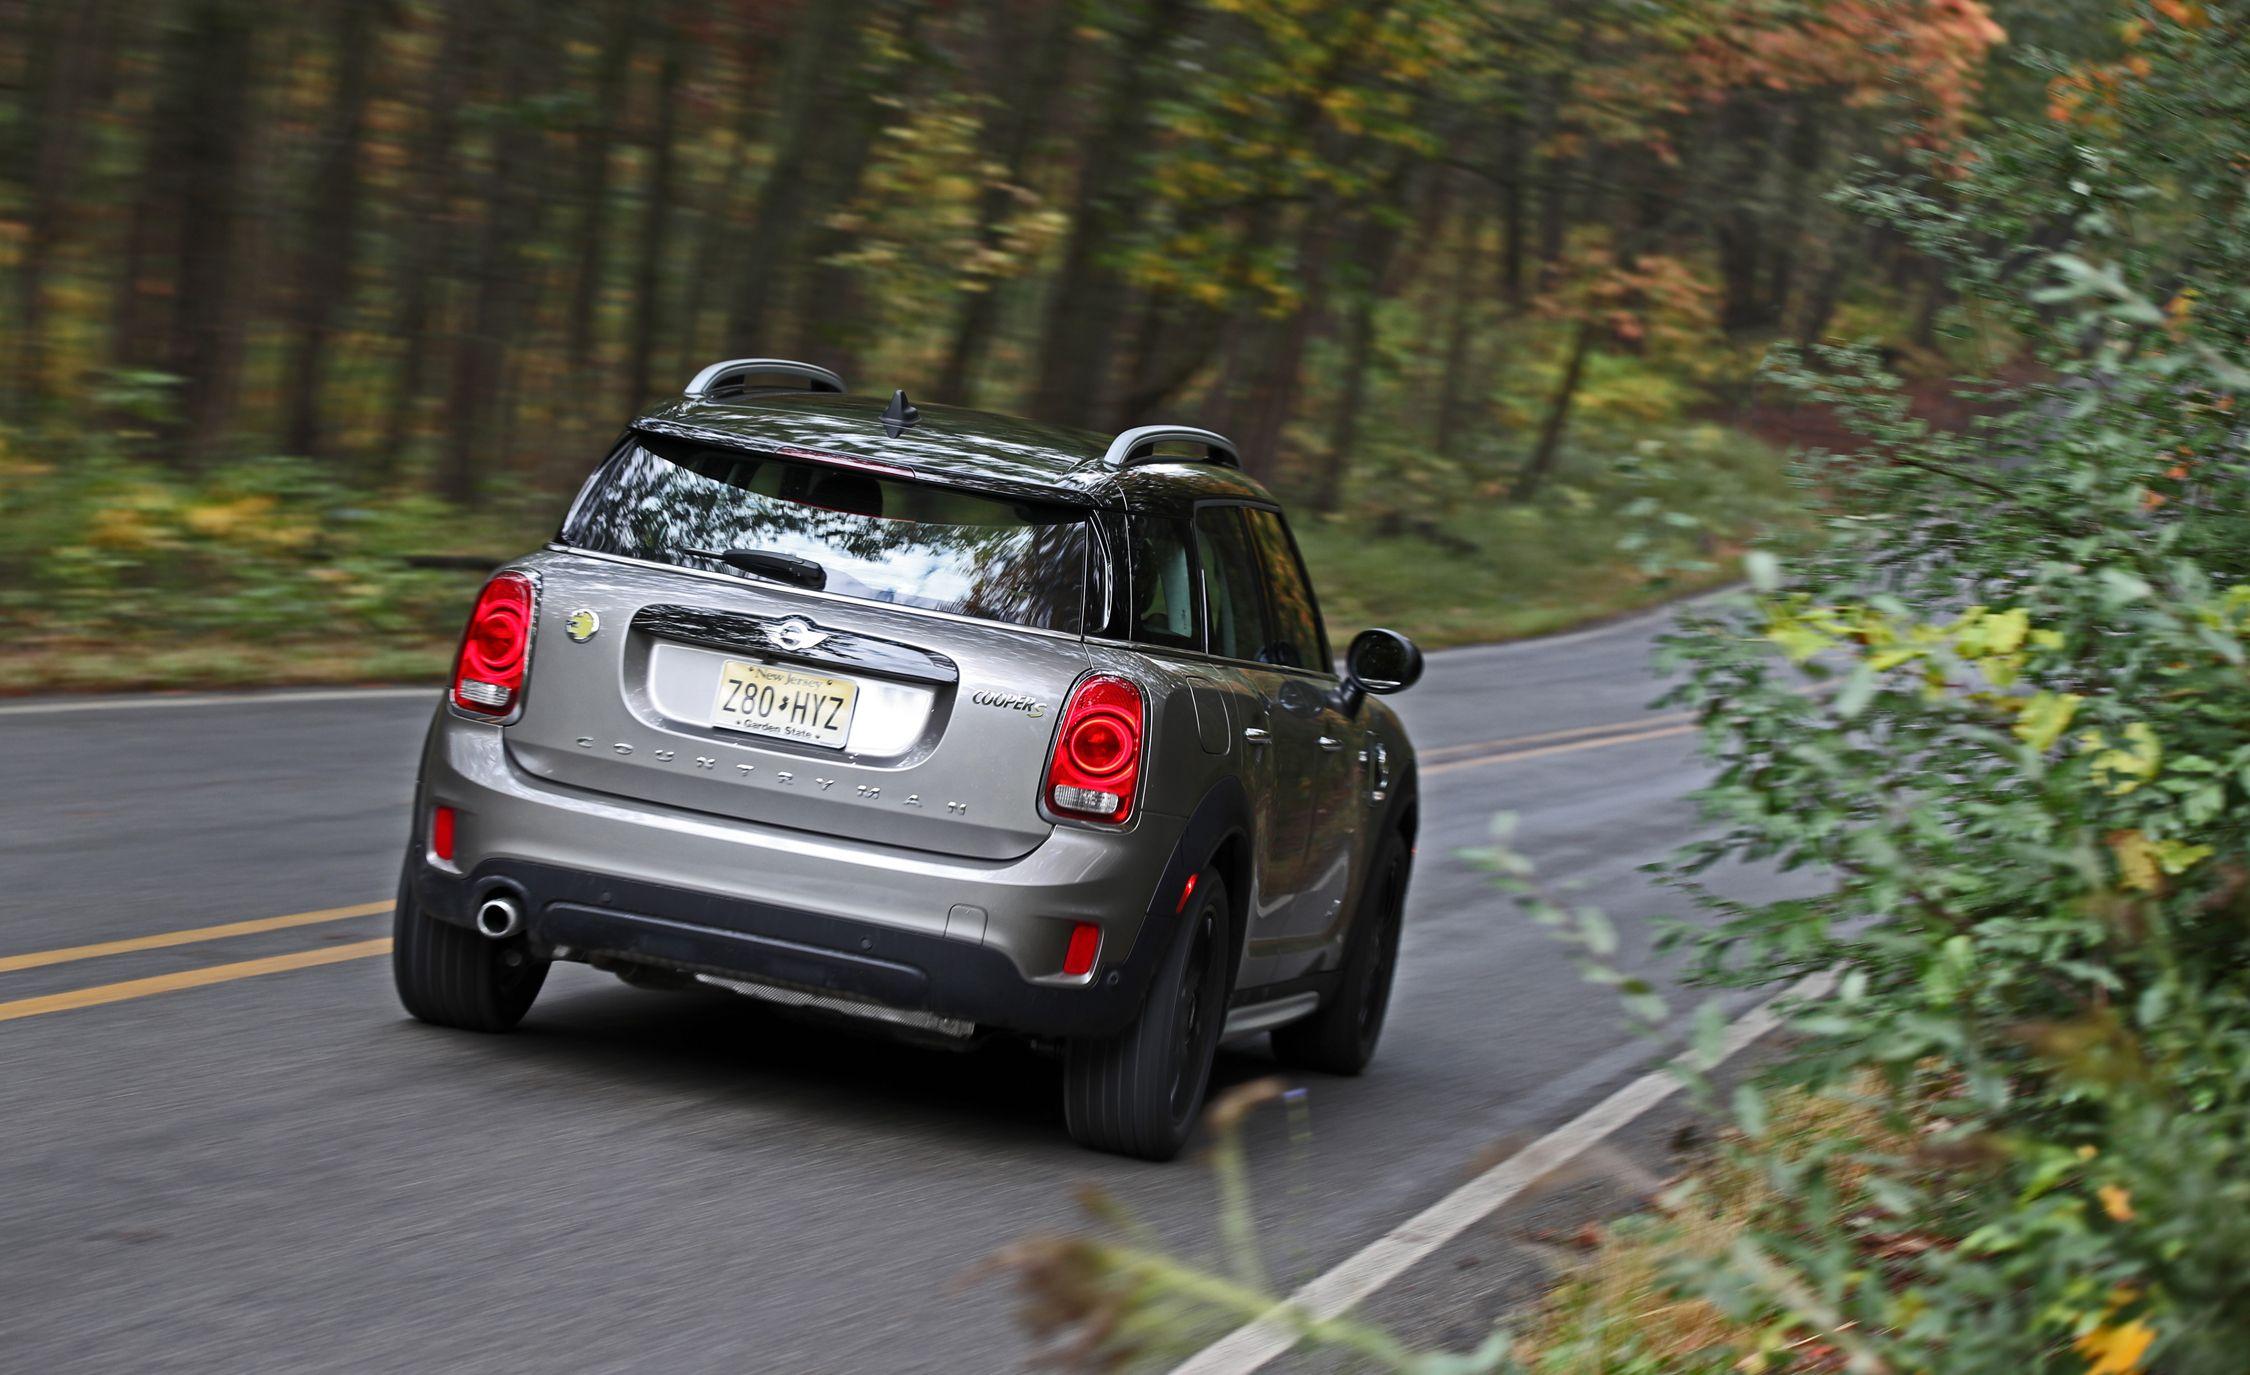 Mini Cooper Countryman S Reviews Brakes Diagram Price Photos And Specs Car Driver